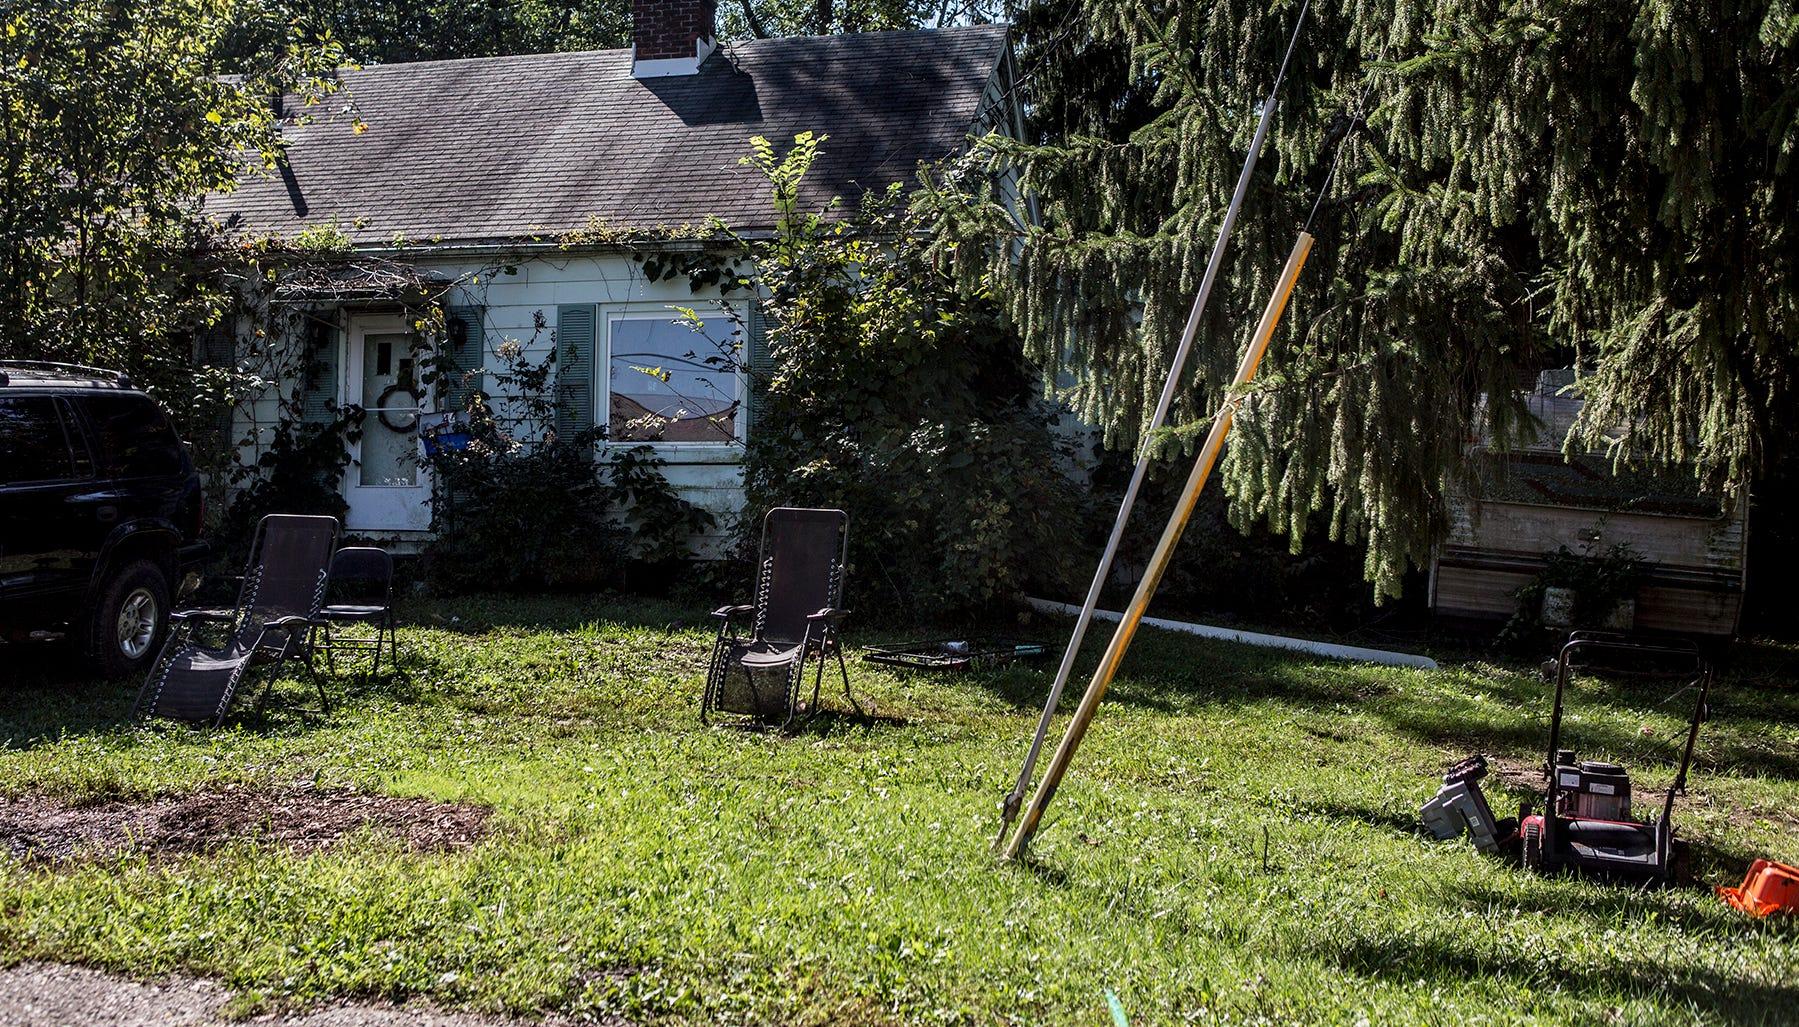 Newark seeks $263,000 from property maintenance violators